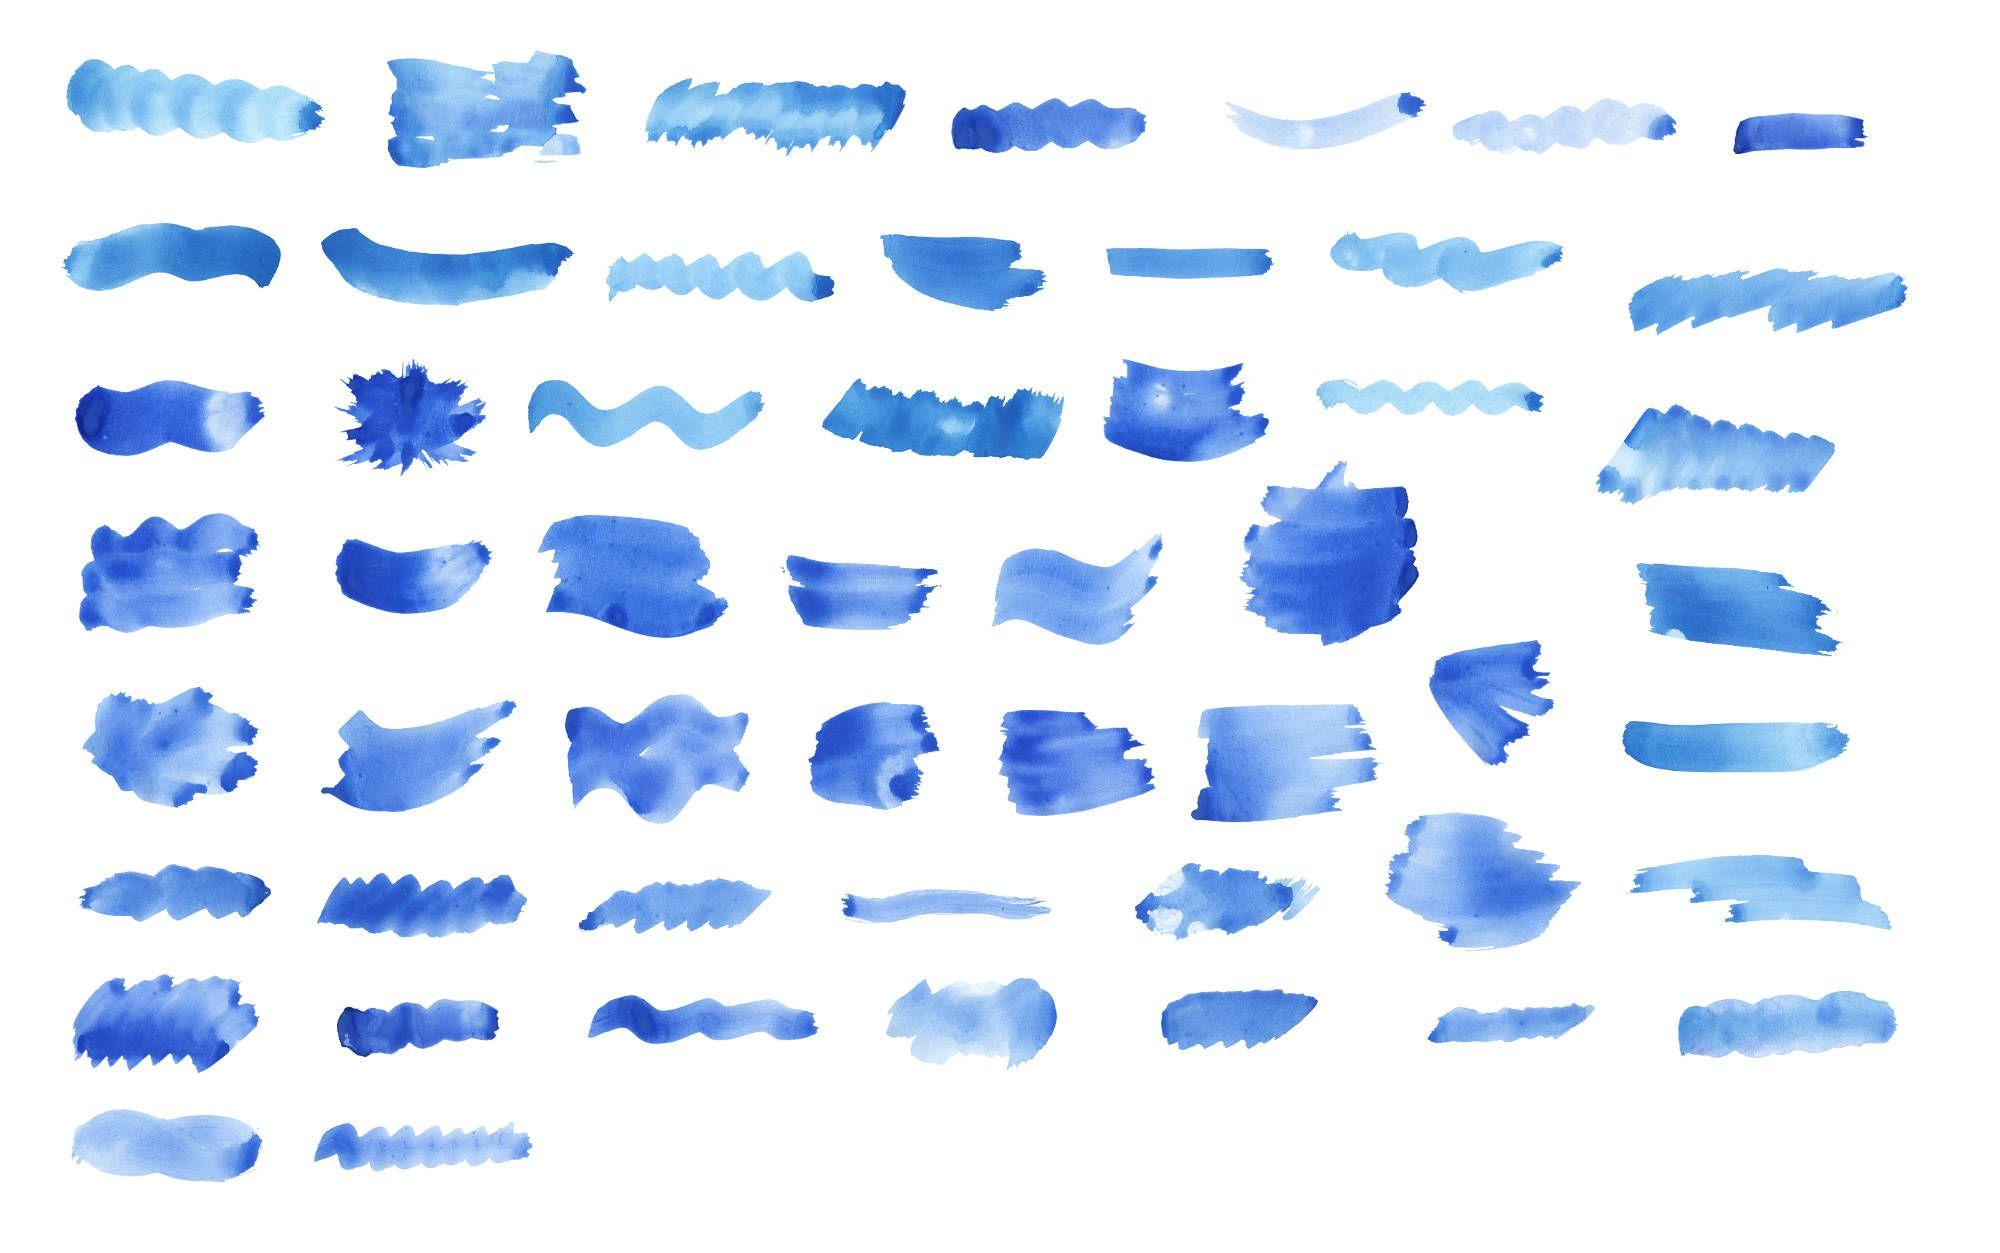 52 Blue Watercolor Brush Stroke Png Transparent Vol 4 Onlygfx Com Brush Stroke Png Blue Watercolor Watercolor Brushes